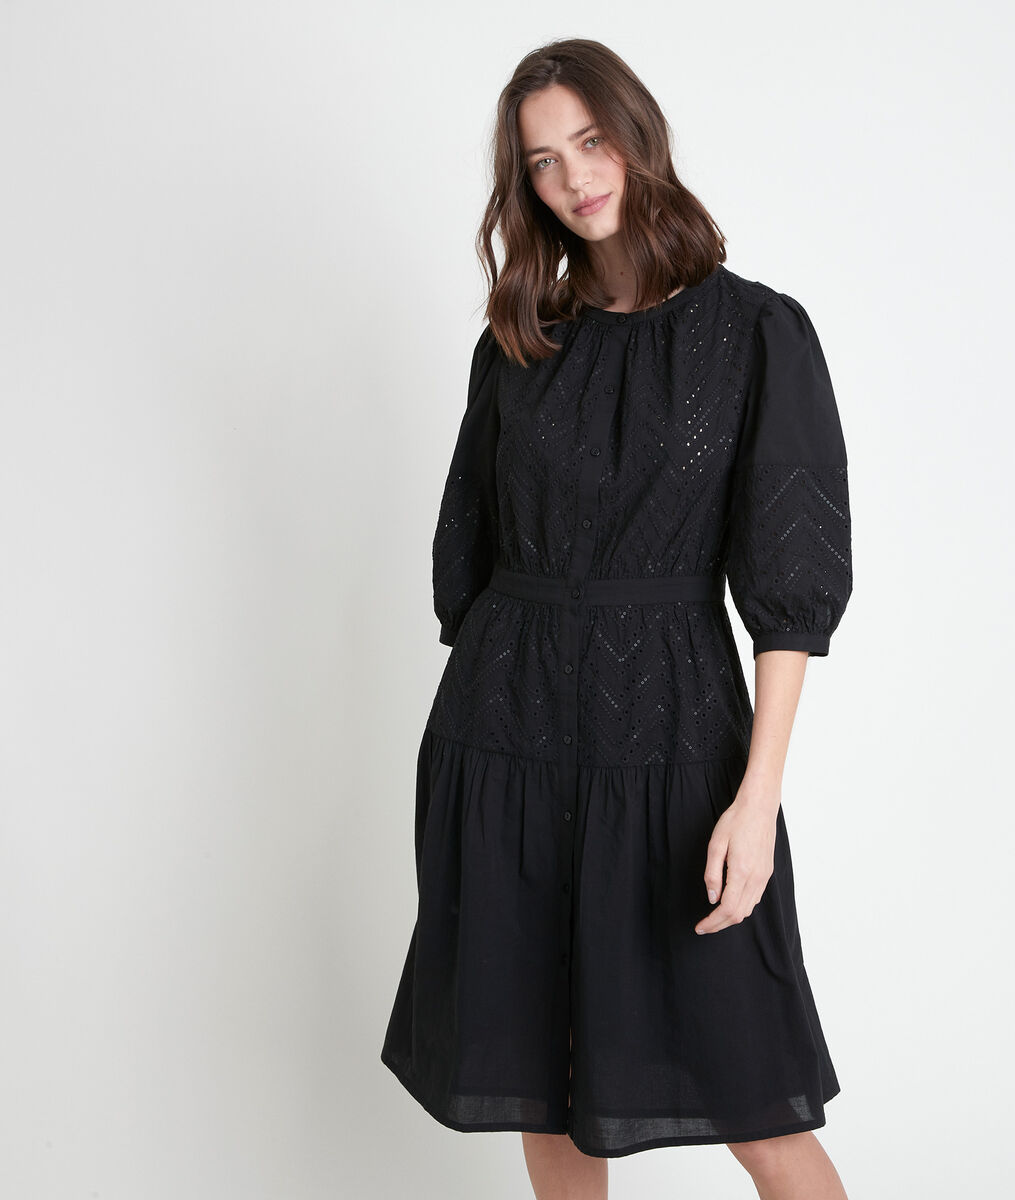 Robe noire brodée Latifa PhotoZ   1-2-3